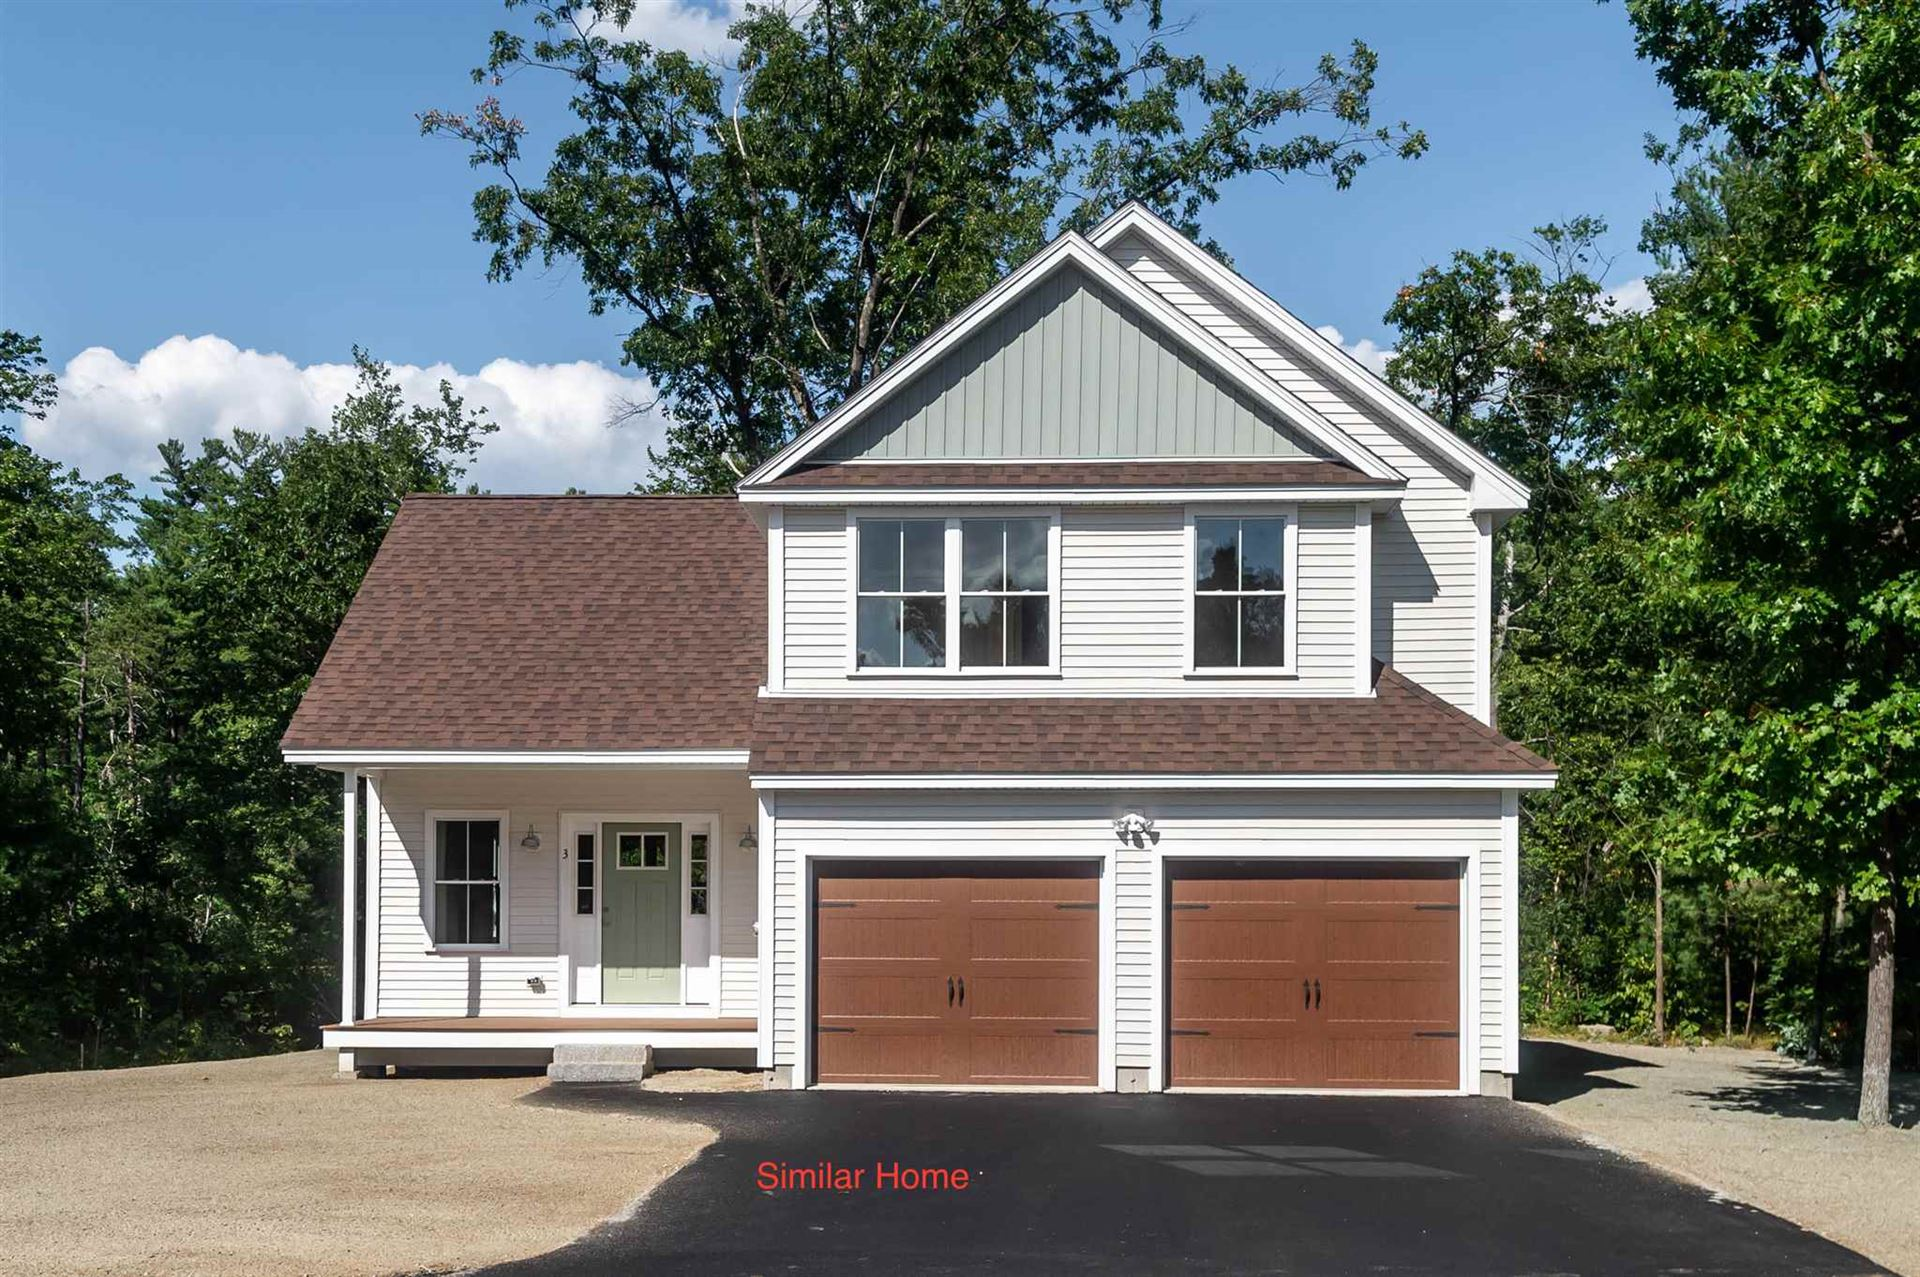 2 Jessica Drive, Rochester, NH 03867 - MLS#: 4855175